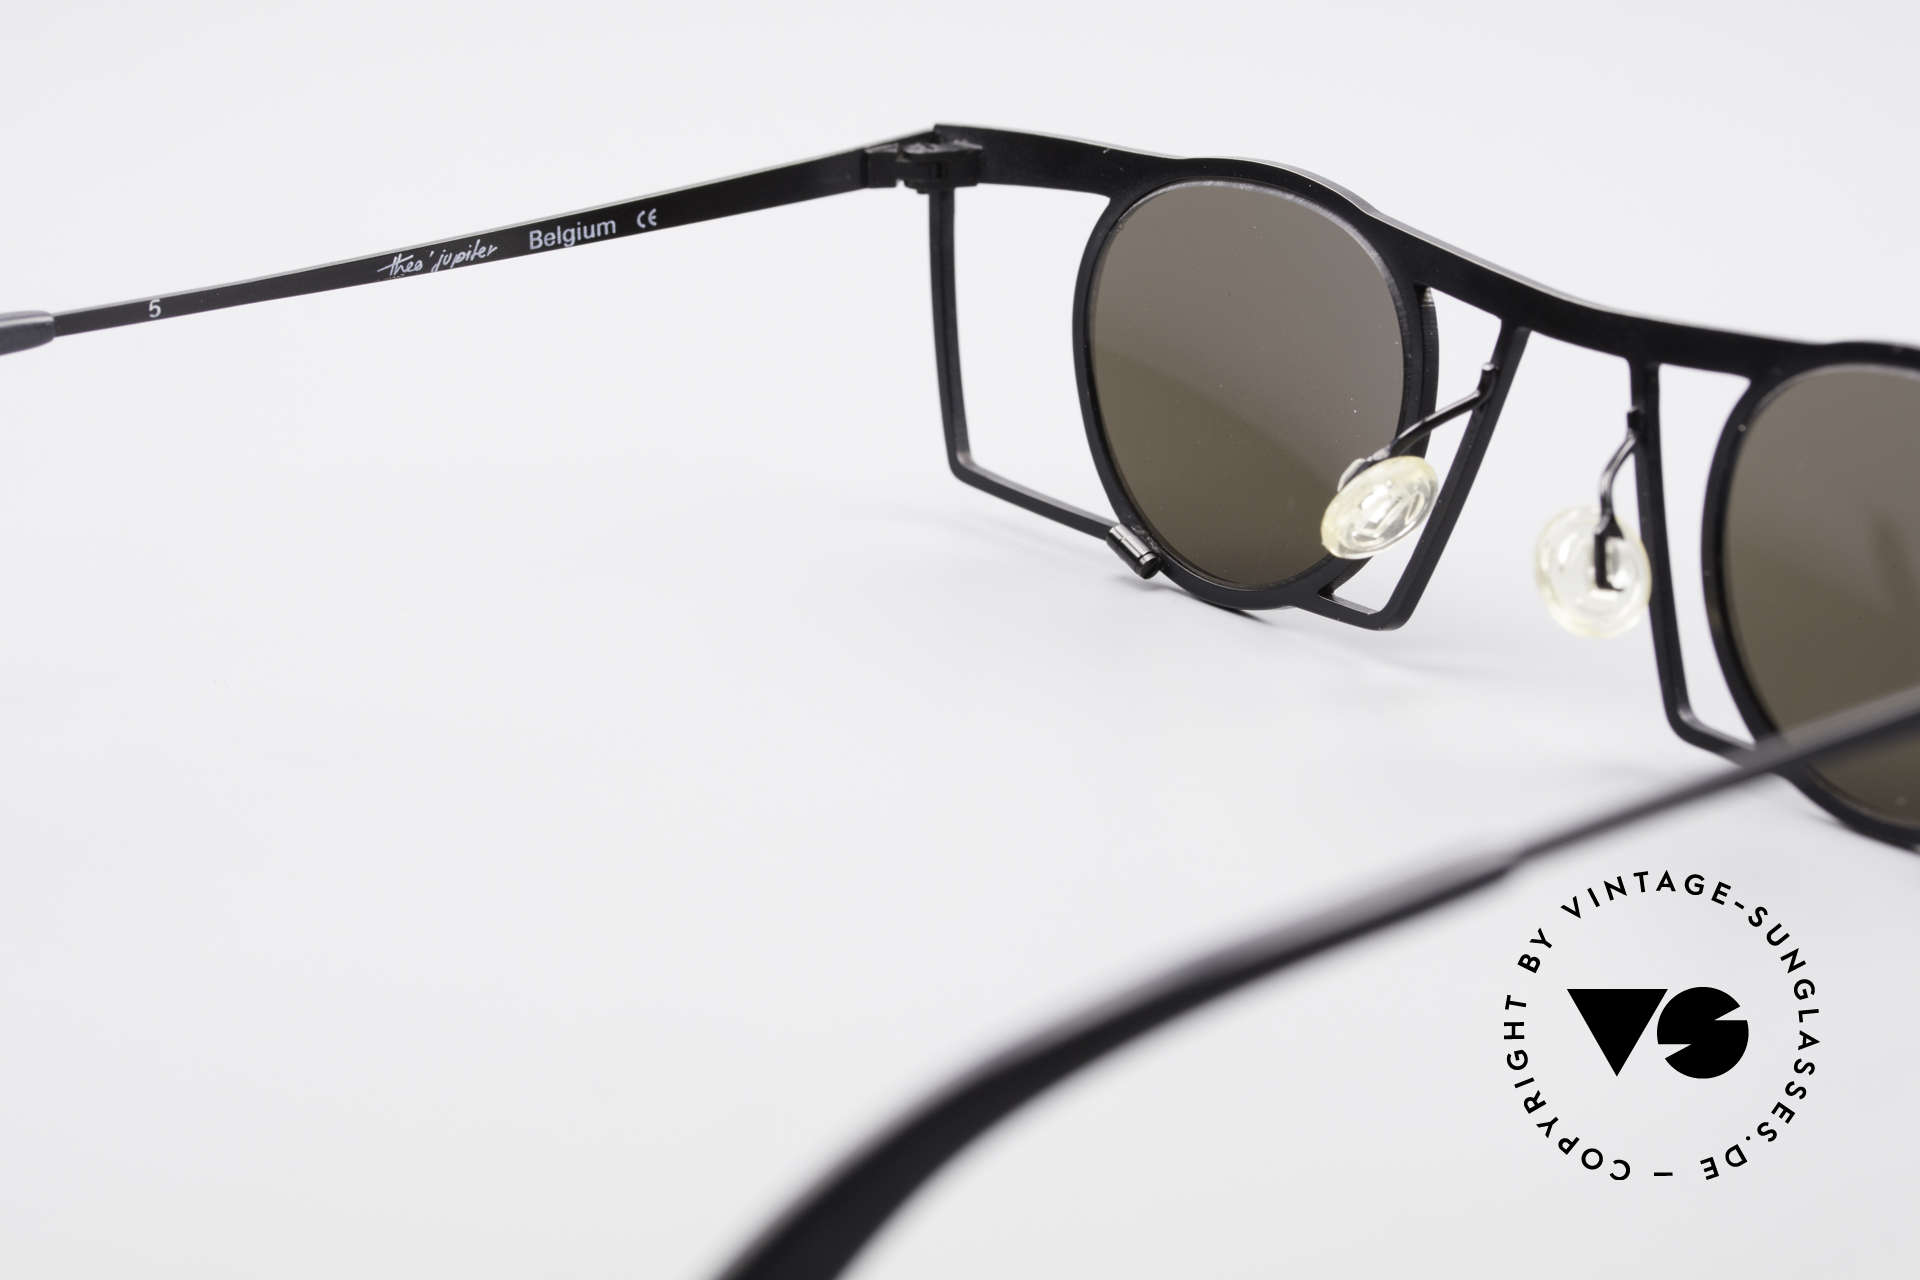 Theo Belgium Jupiter Square Designer Sunglasses, so to speak: vintage sunglasses with representativeness, Made for Men and Women